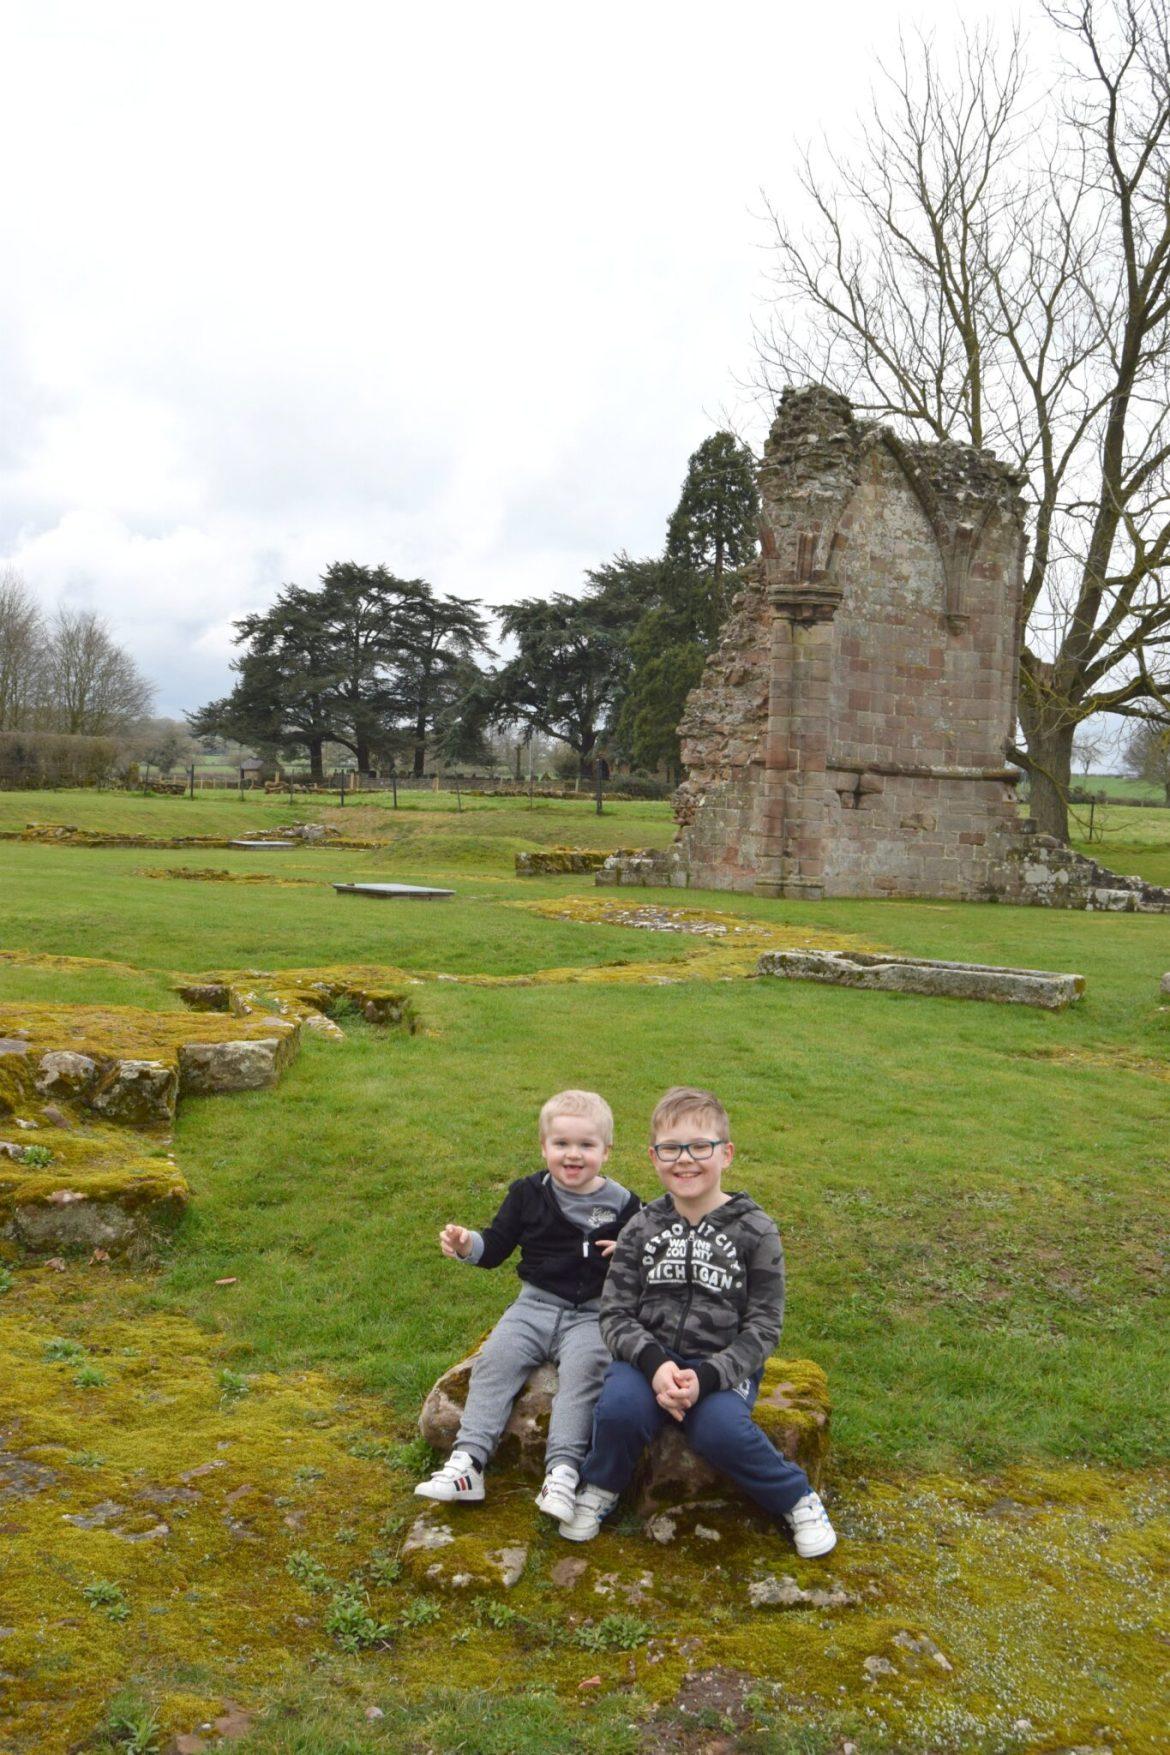 Sitting enjoying the view of Croxdon Abbey